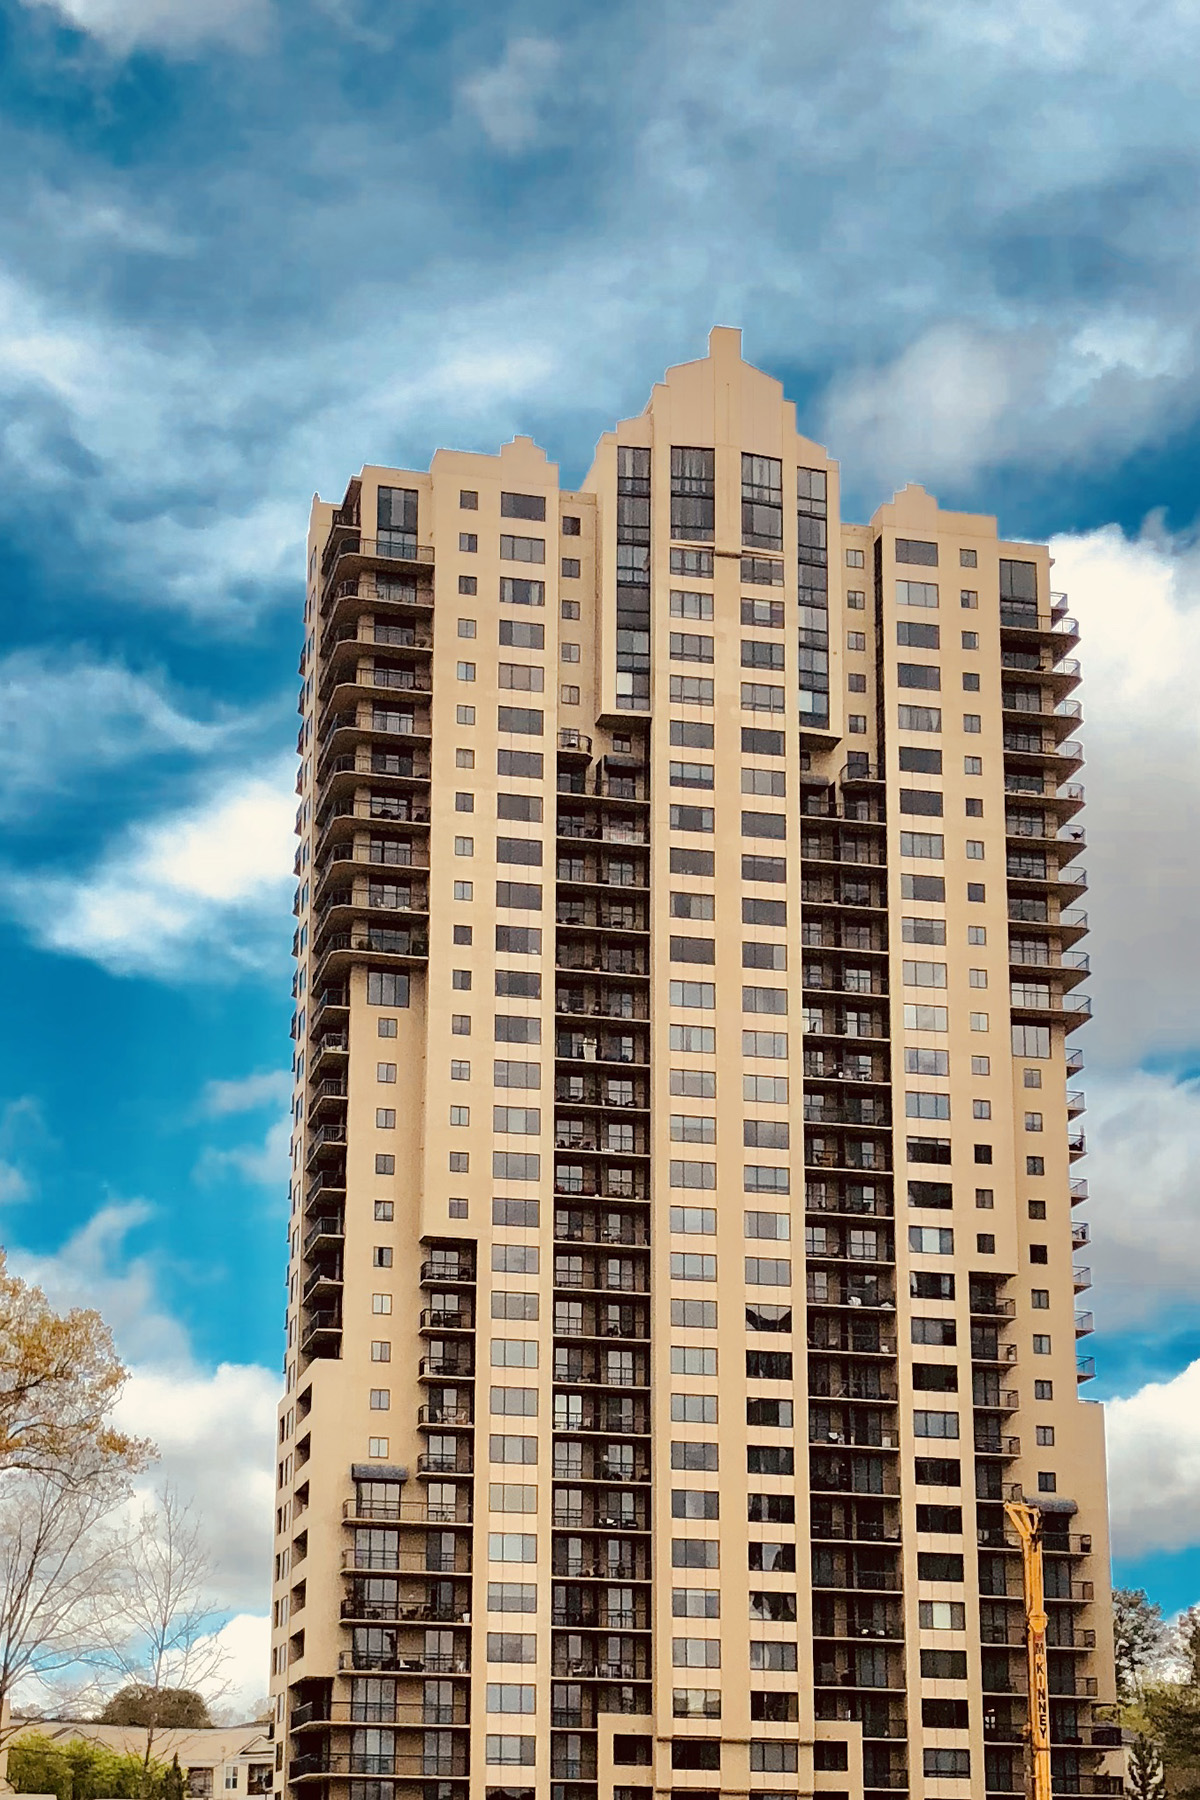 Condominium for Sale at Renovated End Unit Two Bedroom Buckhead Condo With Three Balconies 3481 Lakeside Drive NE #1502 Atlanta, Georgia 30326 United States